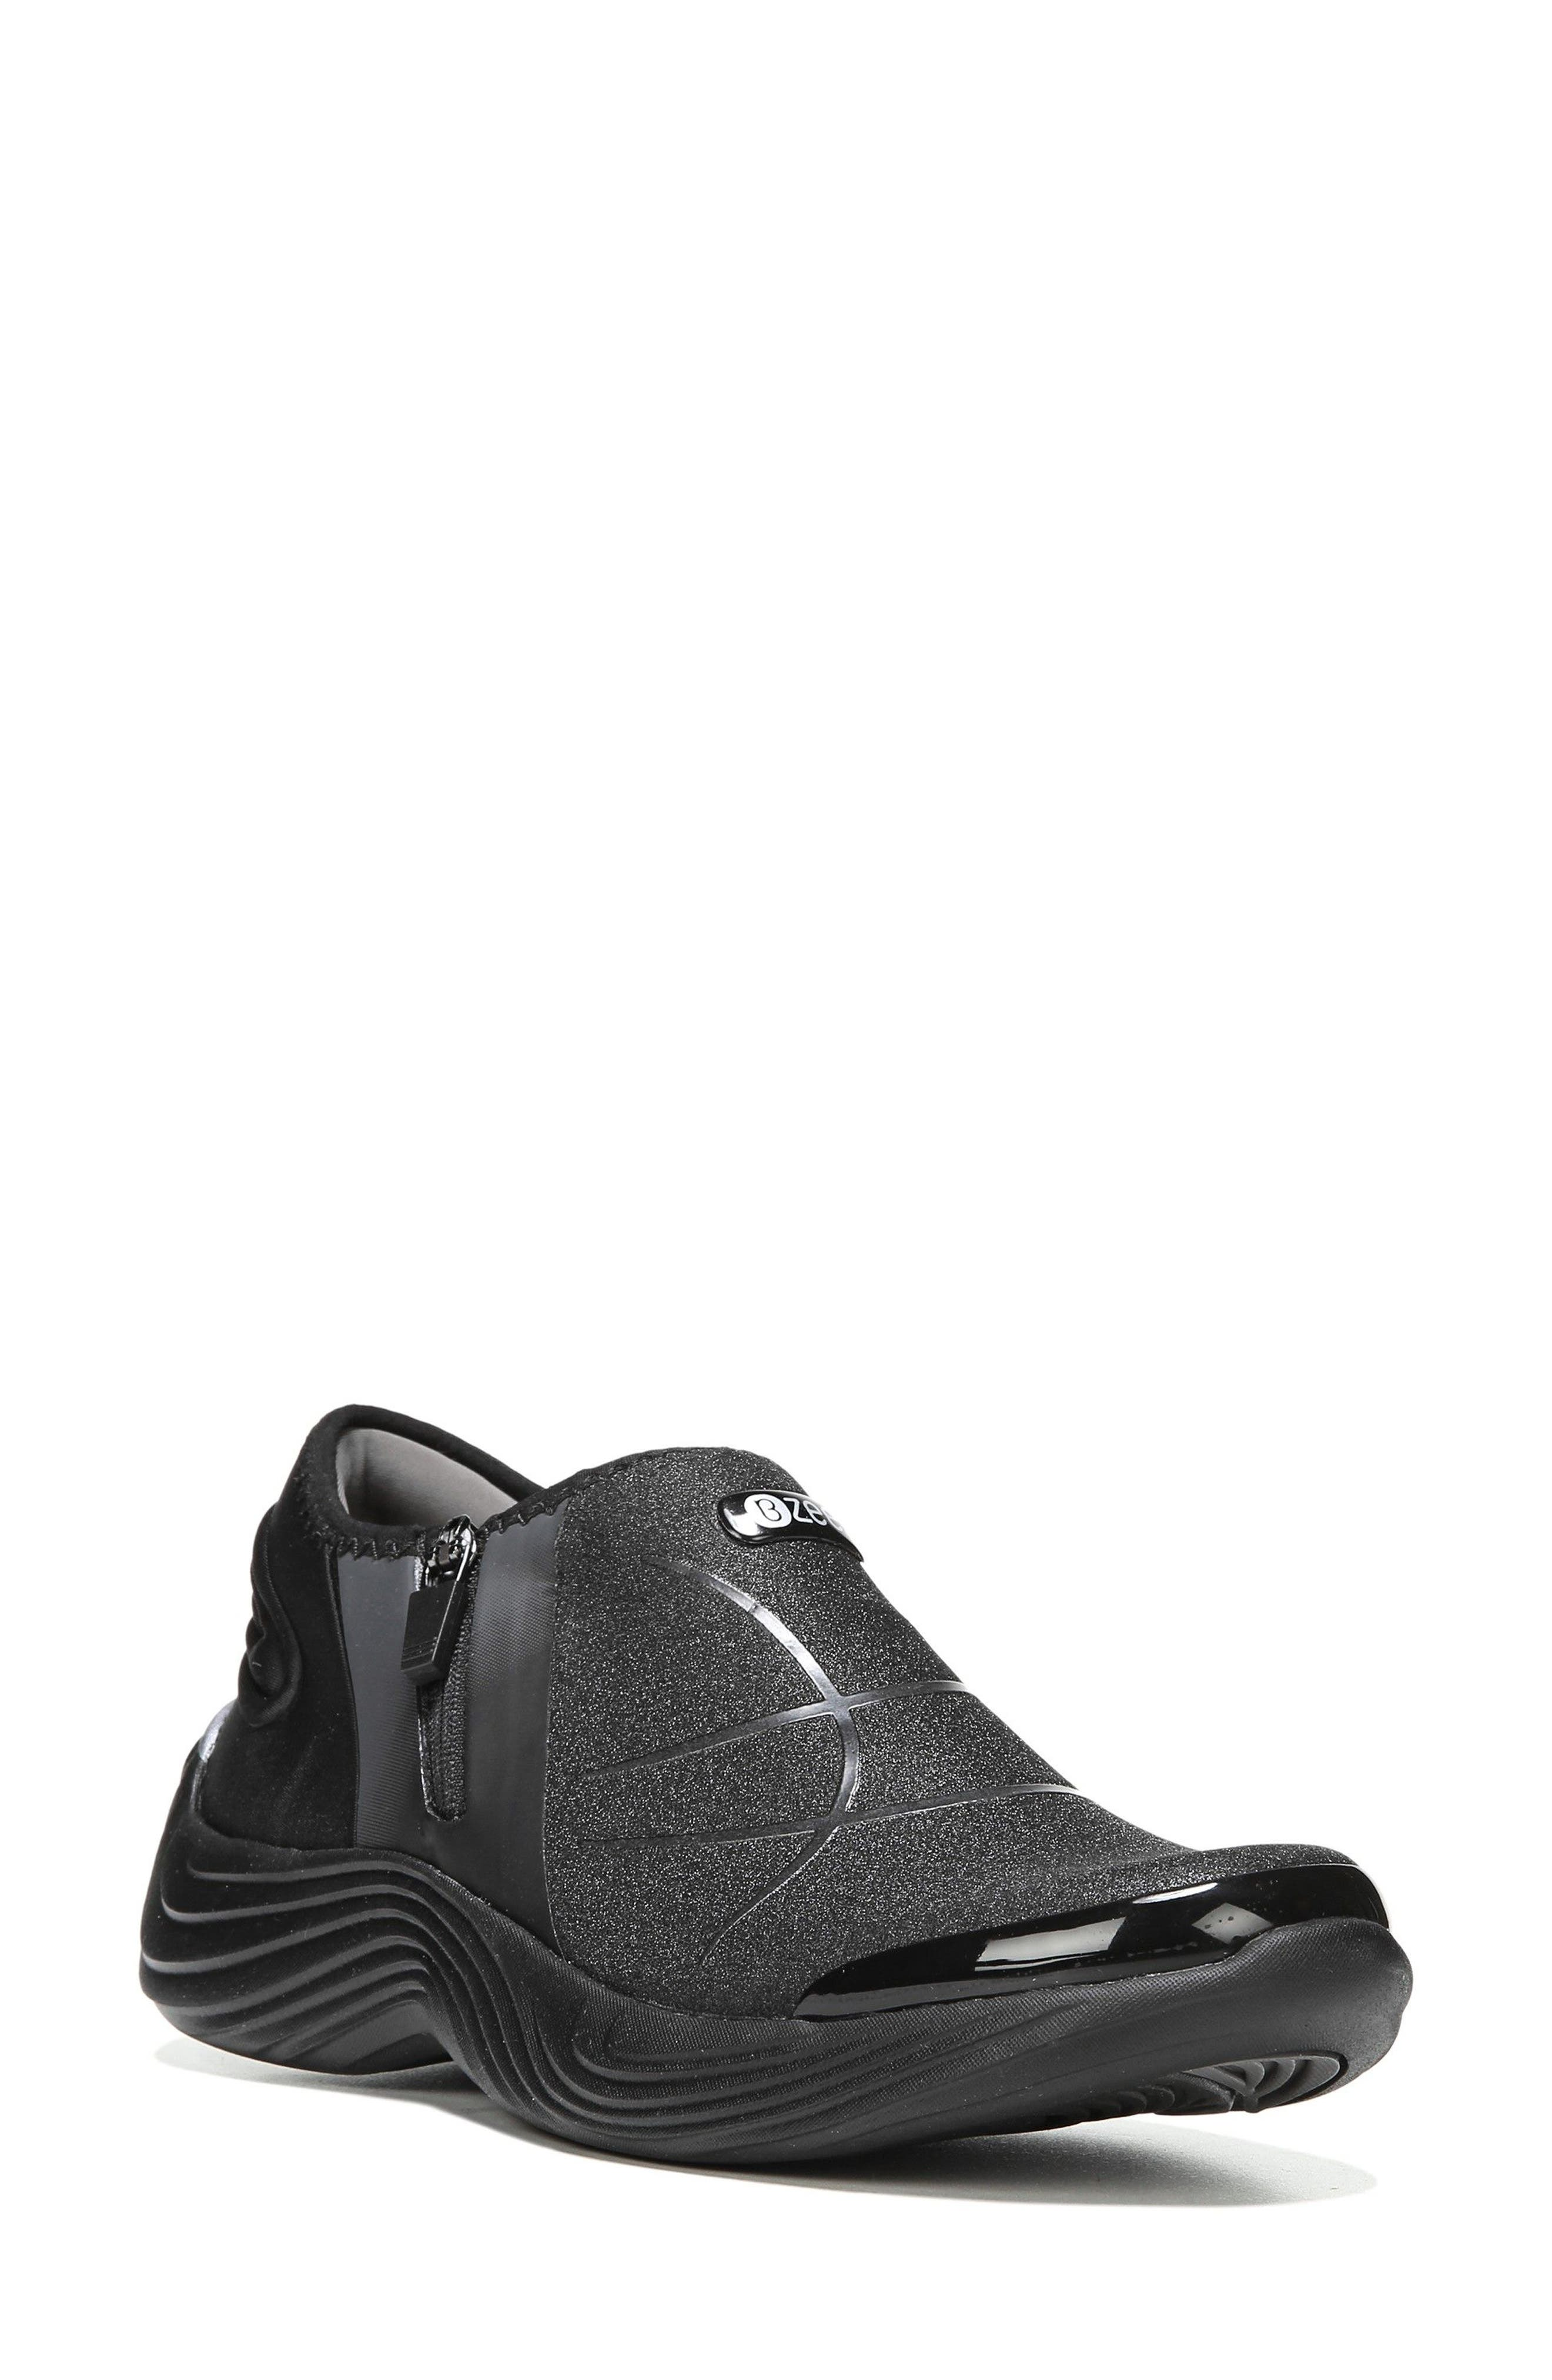 Trilogy Slip-On Sneaker,                         Main,                         color, 001